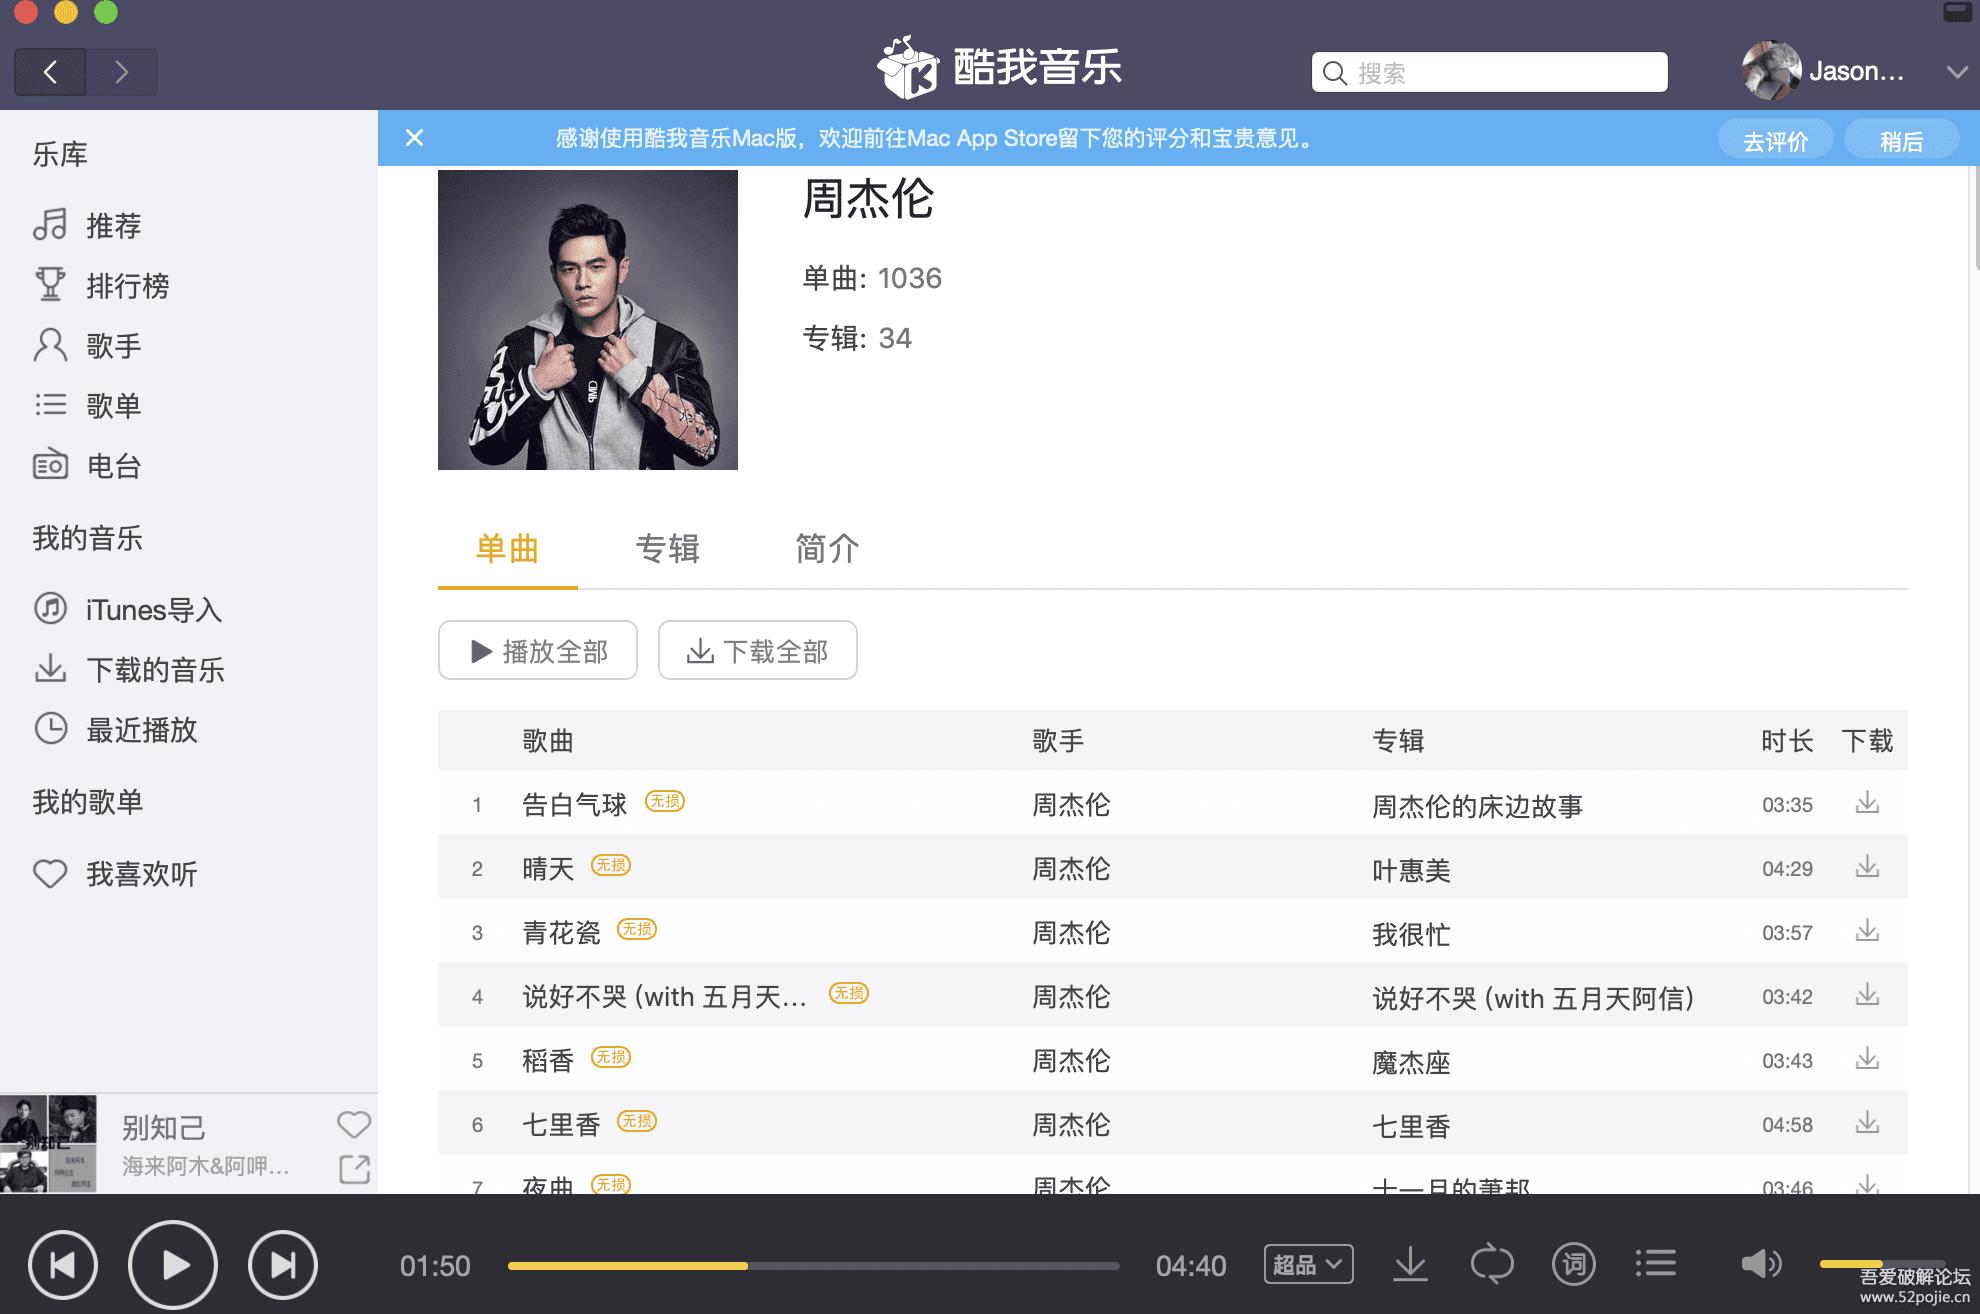 酷我音乐 v1.4.0 for Mac VIP激活版